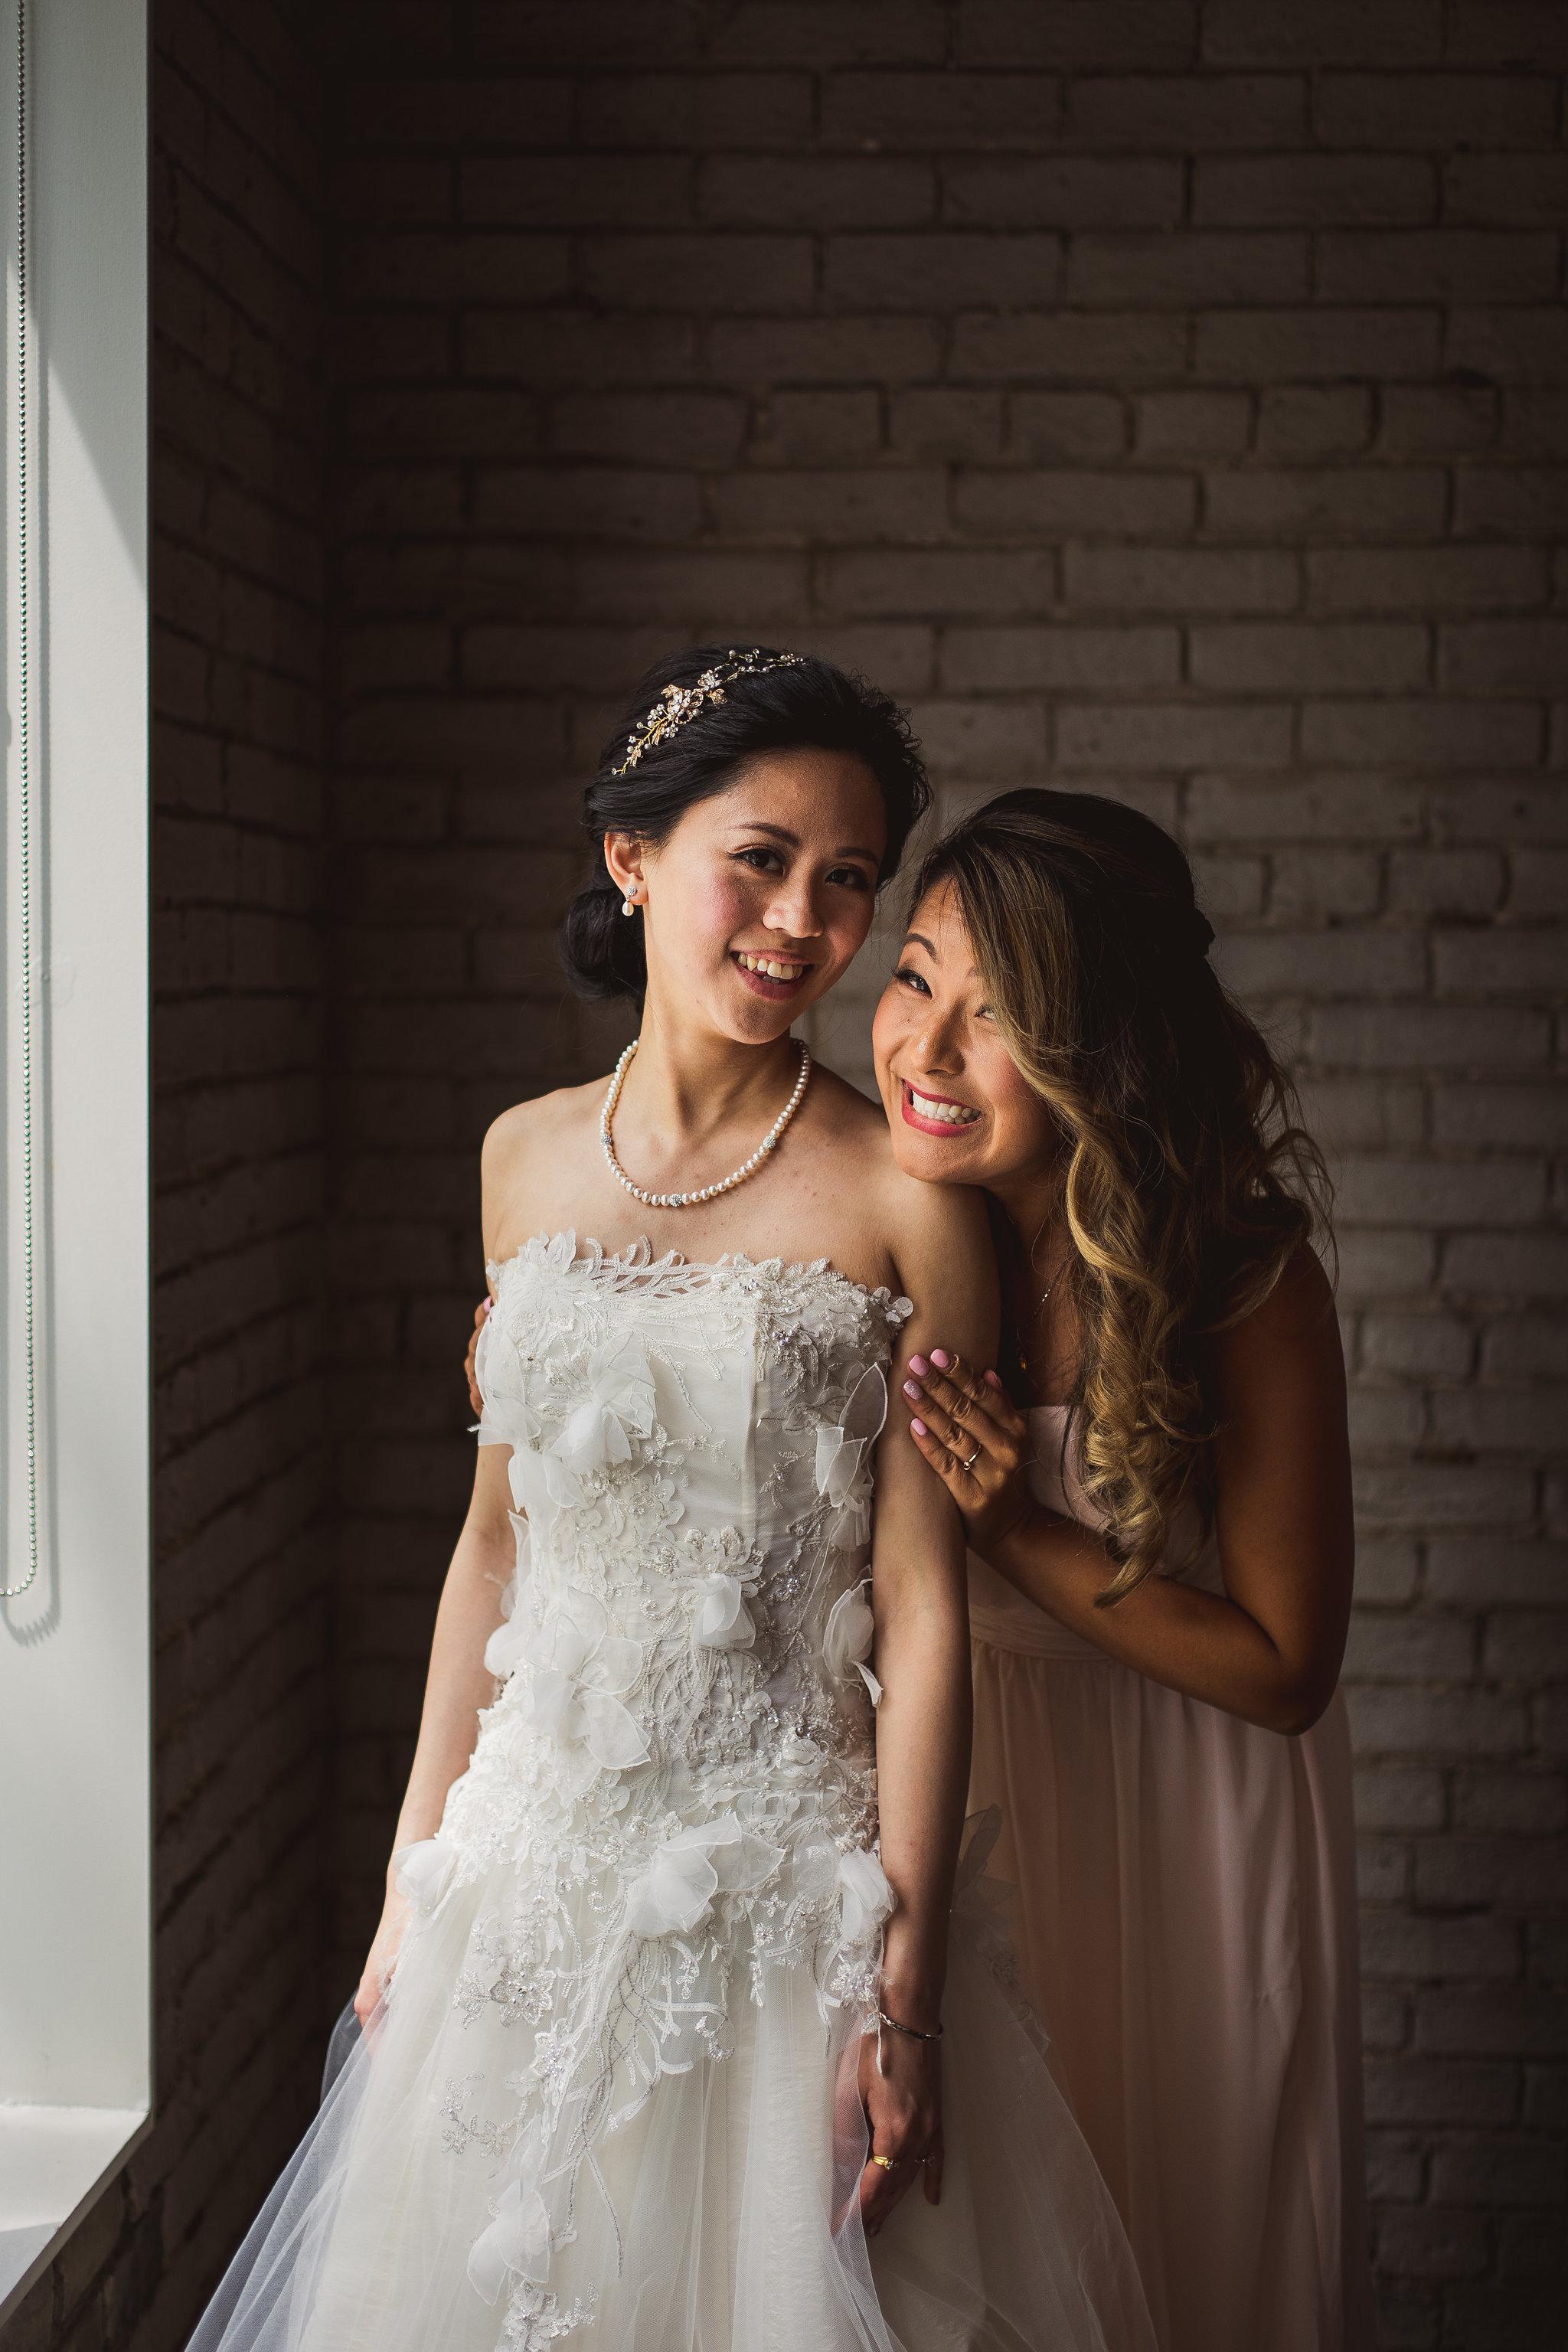 Jessica Jason Hotel Ocho Wedding Photos 131 - Hotel Ocho Wedding